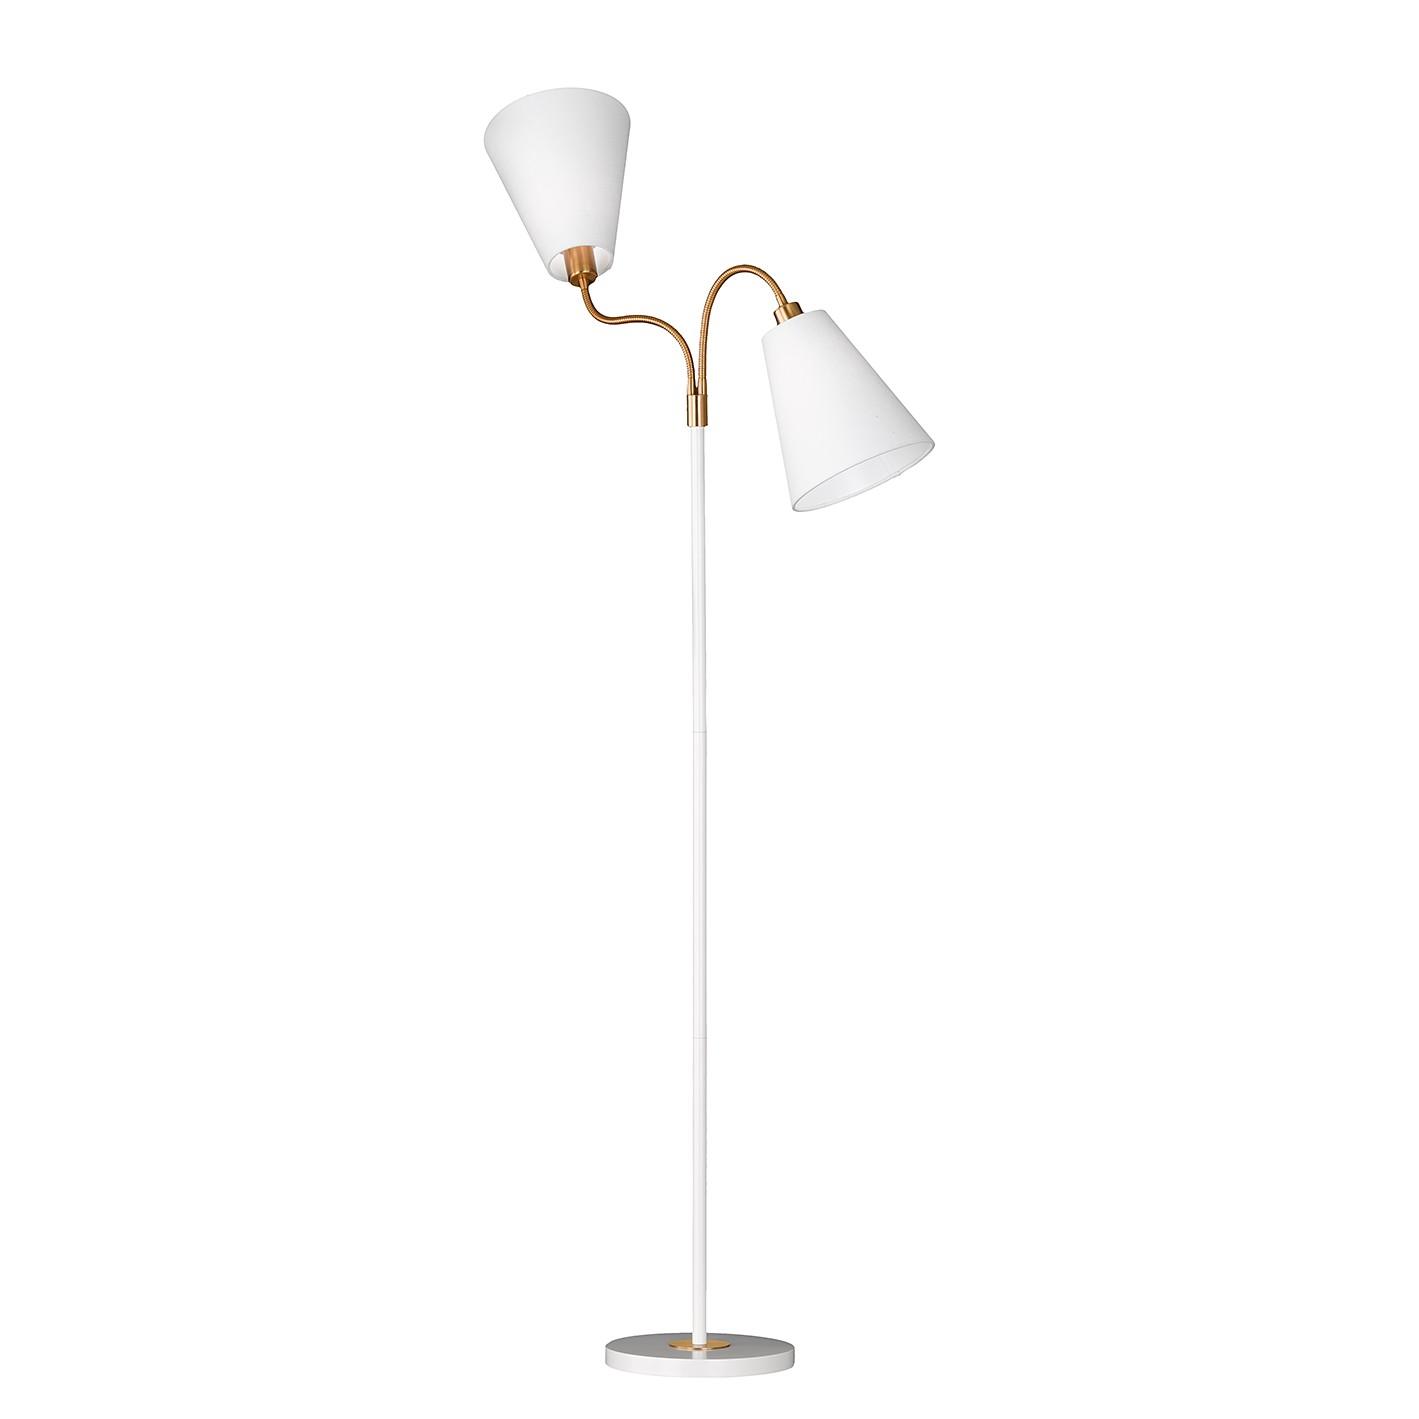 EEK A++, Lampadaire Hopper I - Tissu / Fer - 2 - Blanc, Honsel